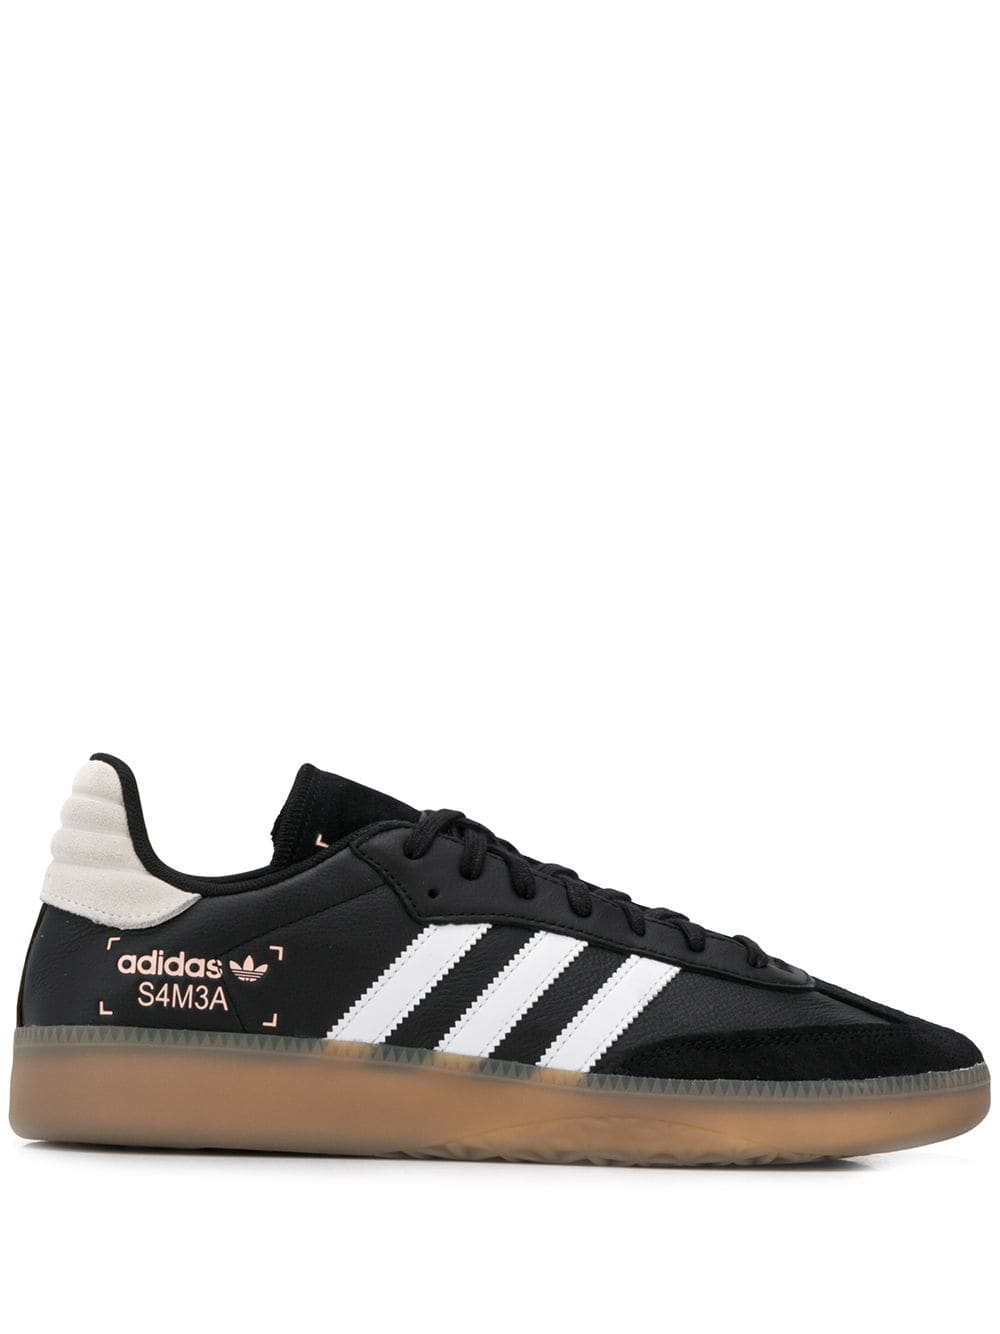 new arrival 521c8 7758d Adidas Originals Adidas  Samba Rm  Sneakers - Schwarz ...